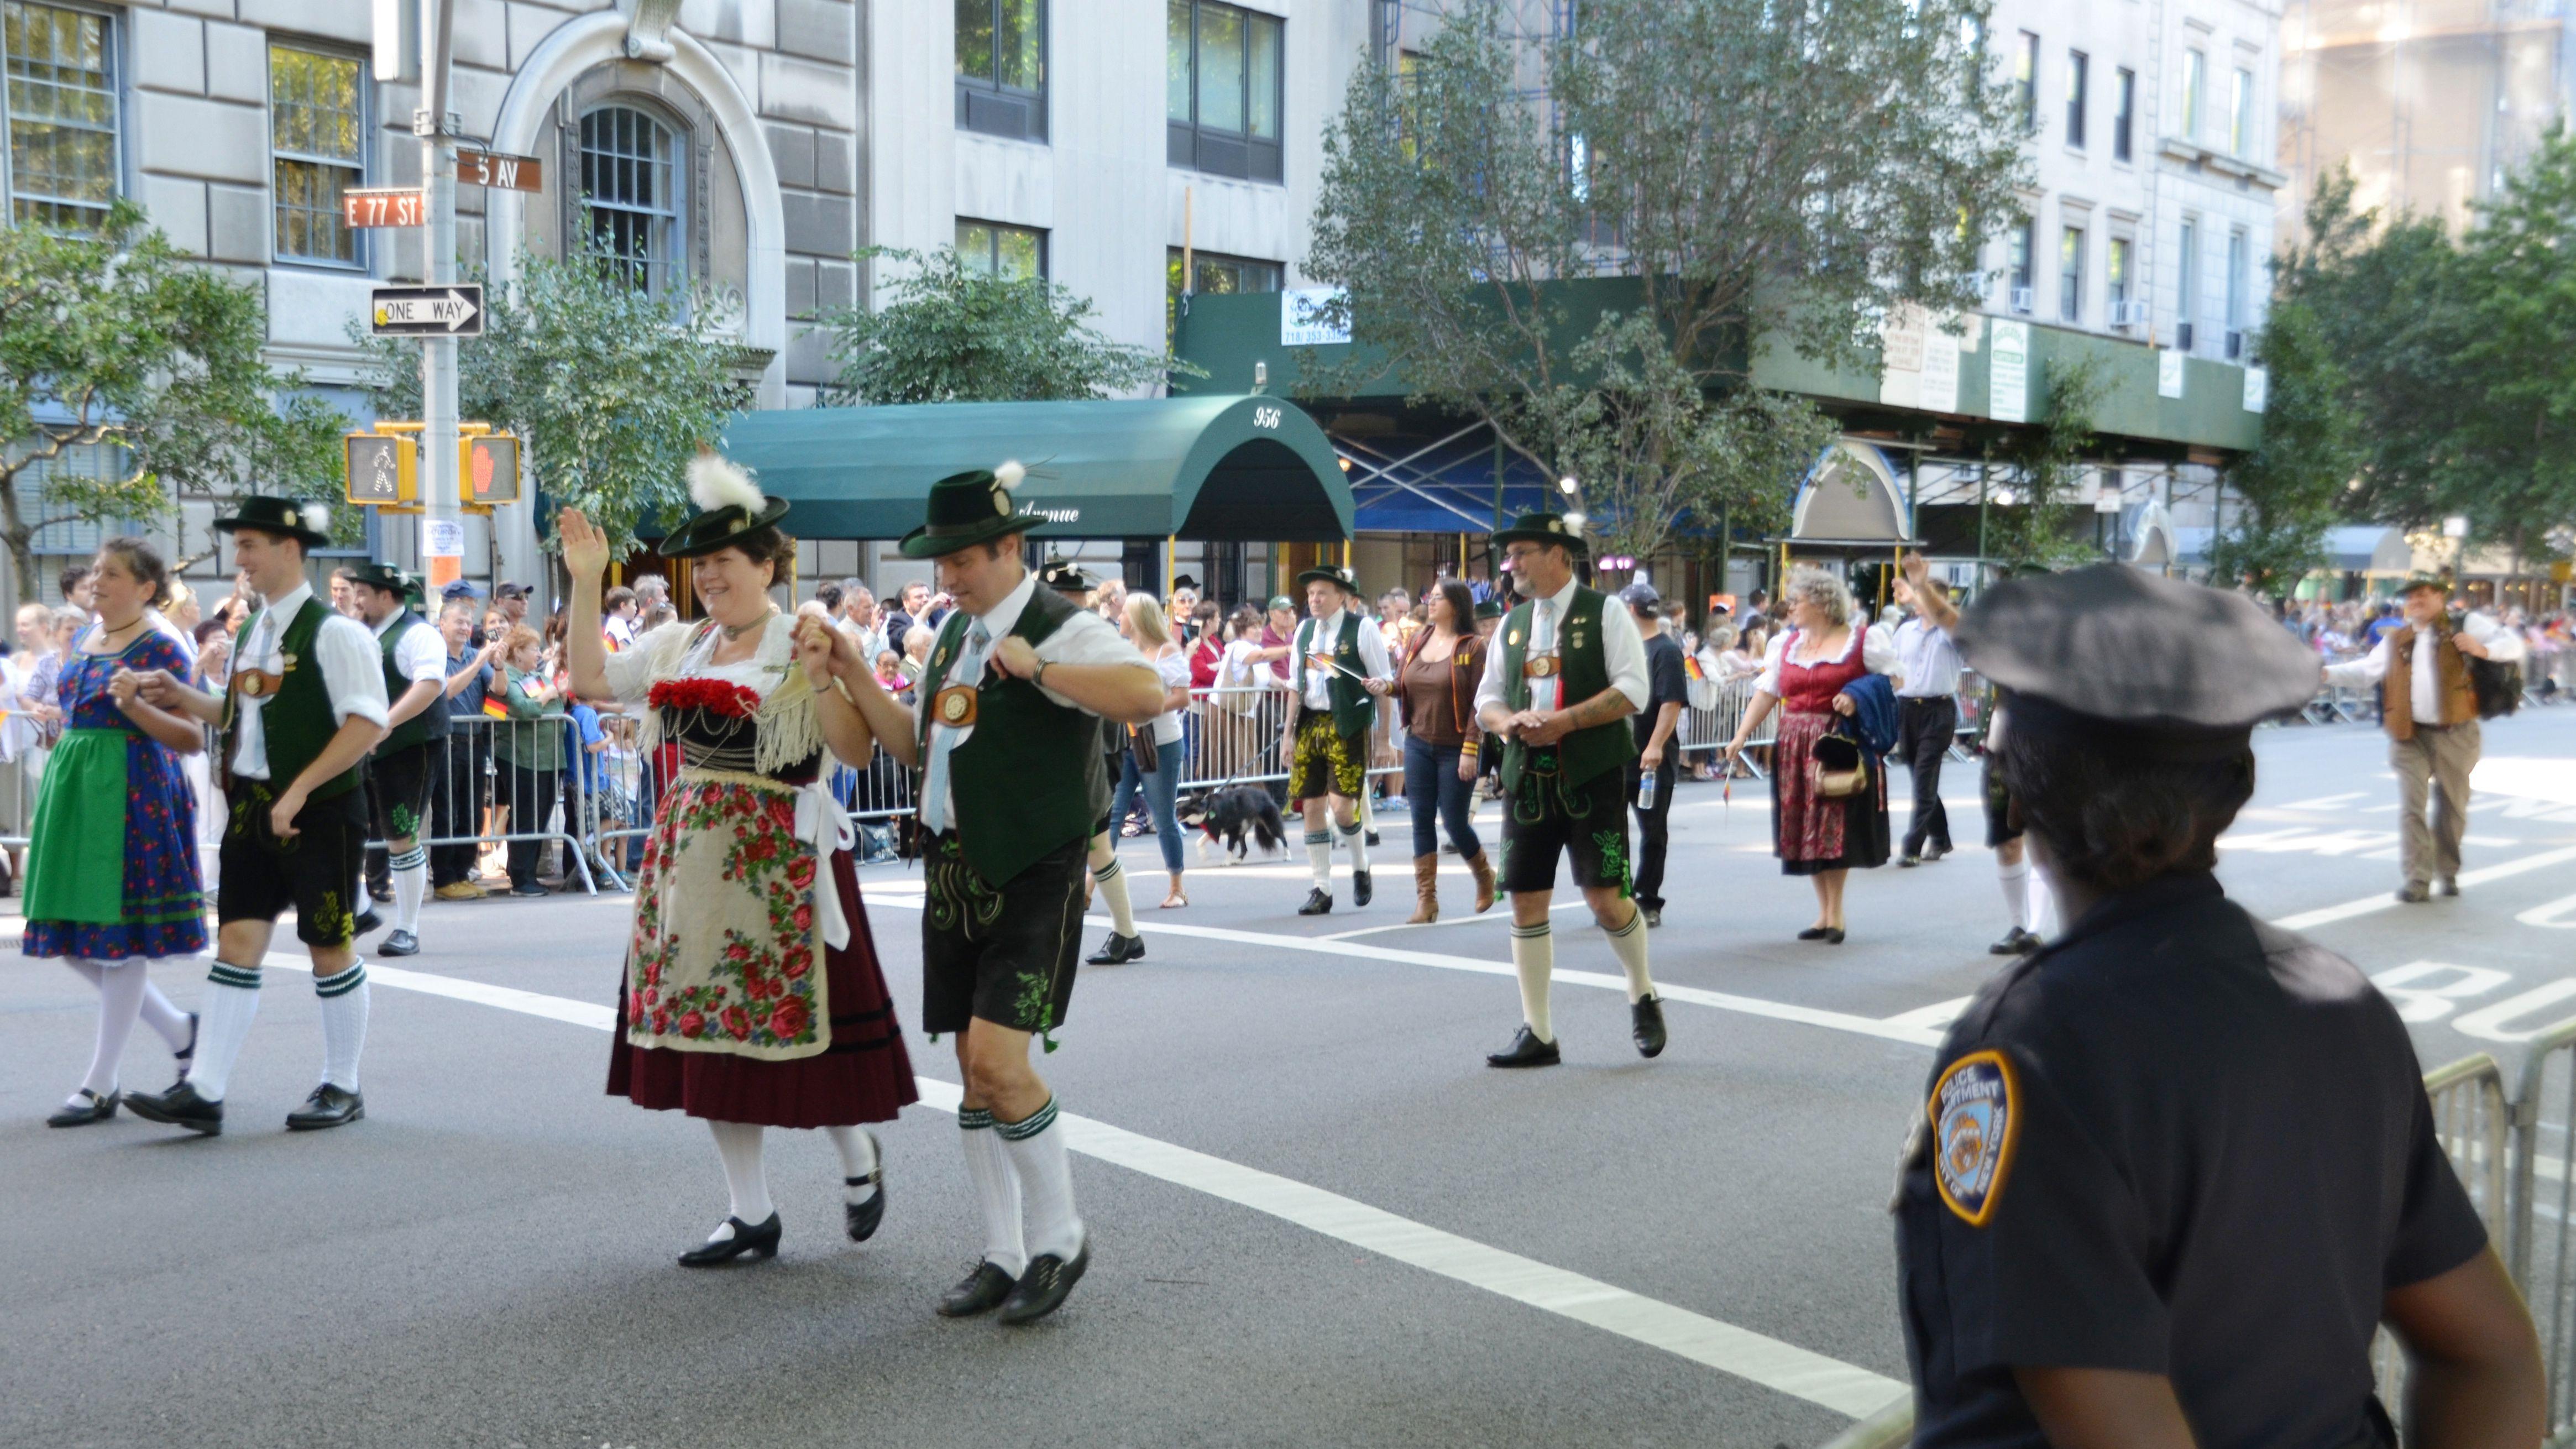 Traditionelle Steubenparade in der 5th Avenue in New York